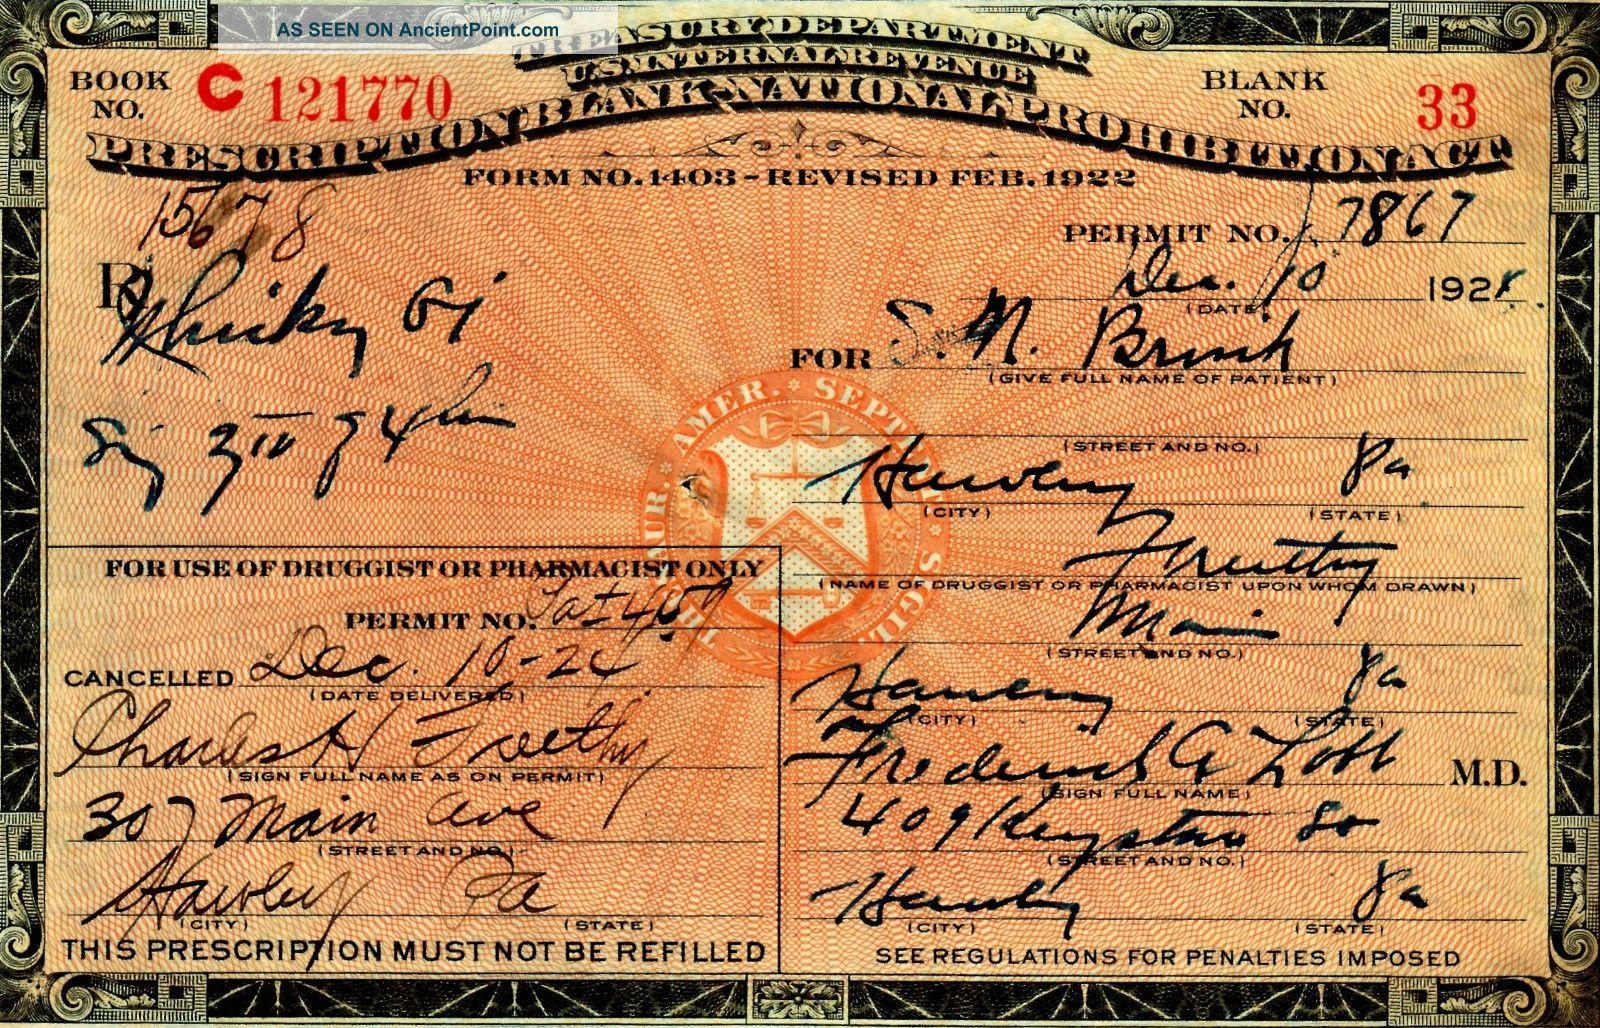 12/10 1924 Prohibition Prescription Doctor Whiskey Whisky Pharmacy